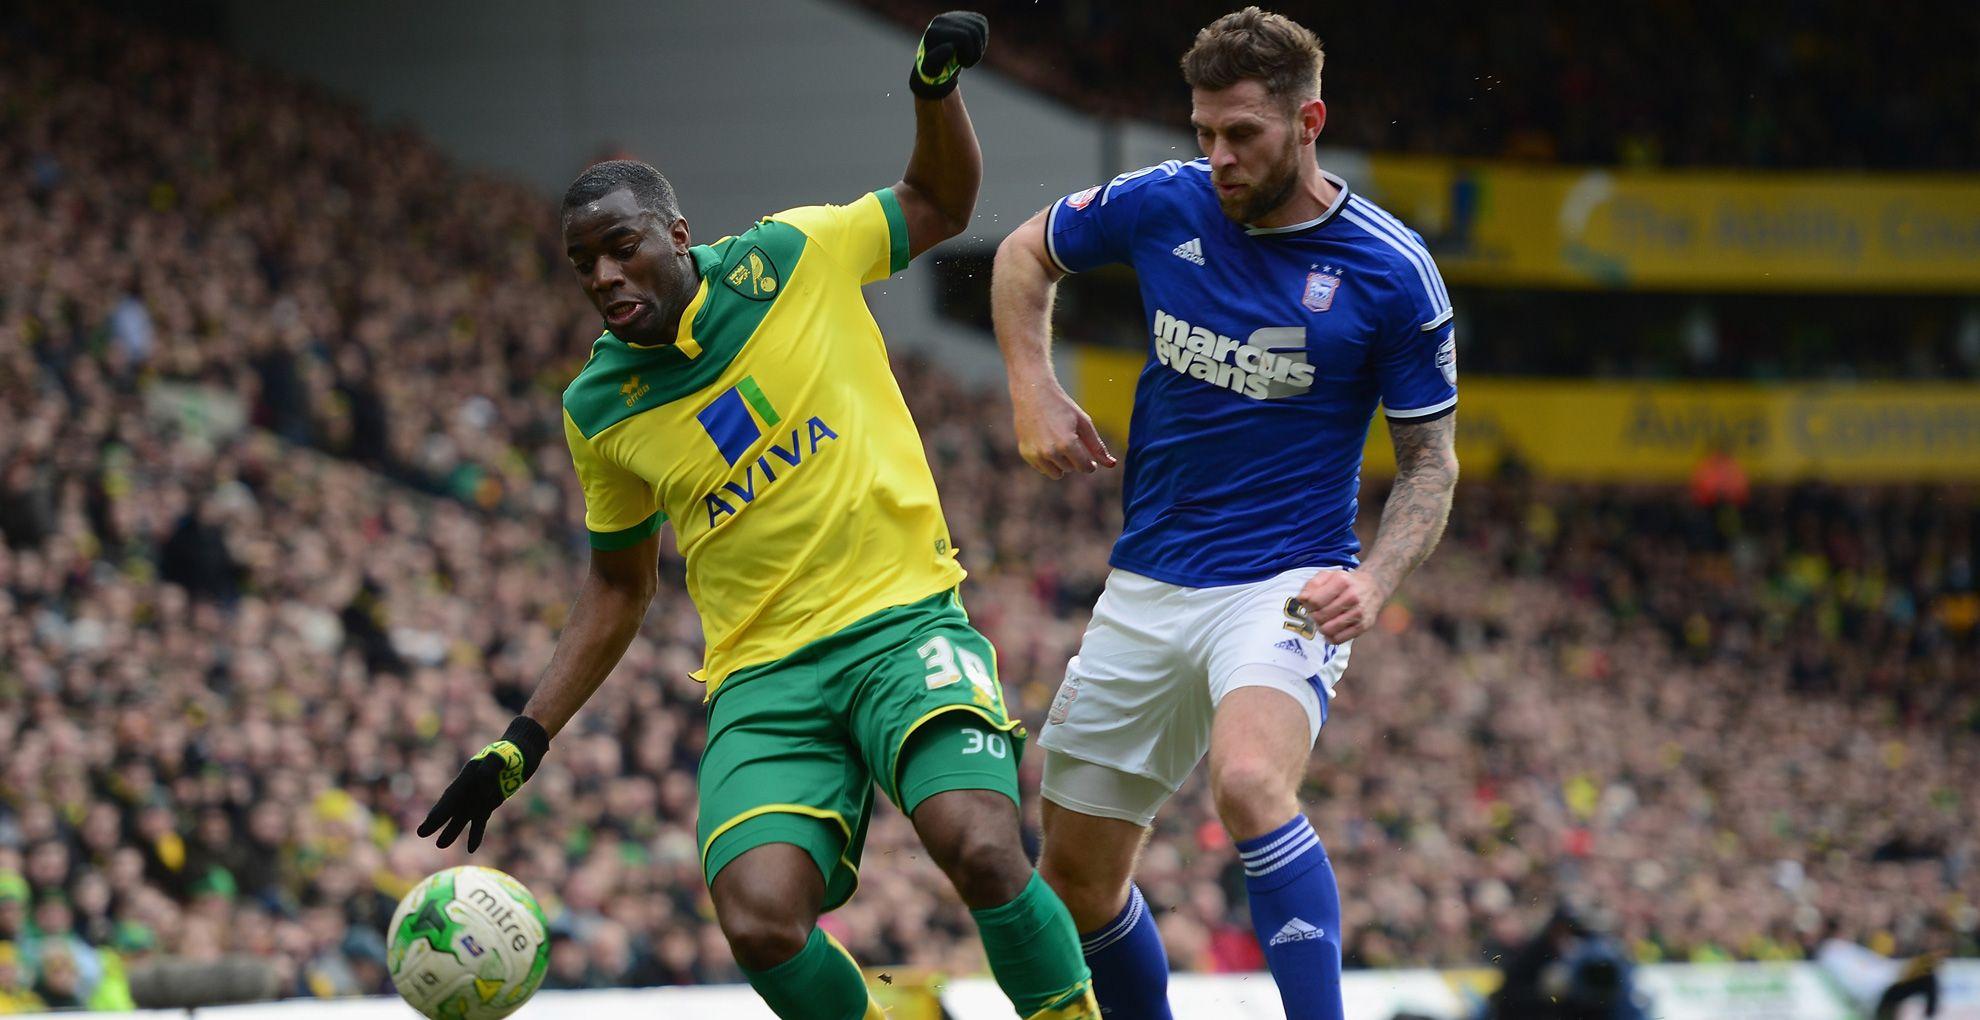 Norwich 2 0 Ipswich Match Report & Highlights PL